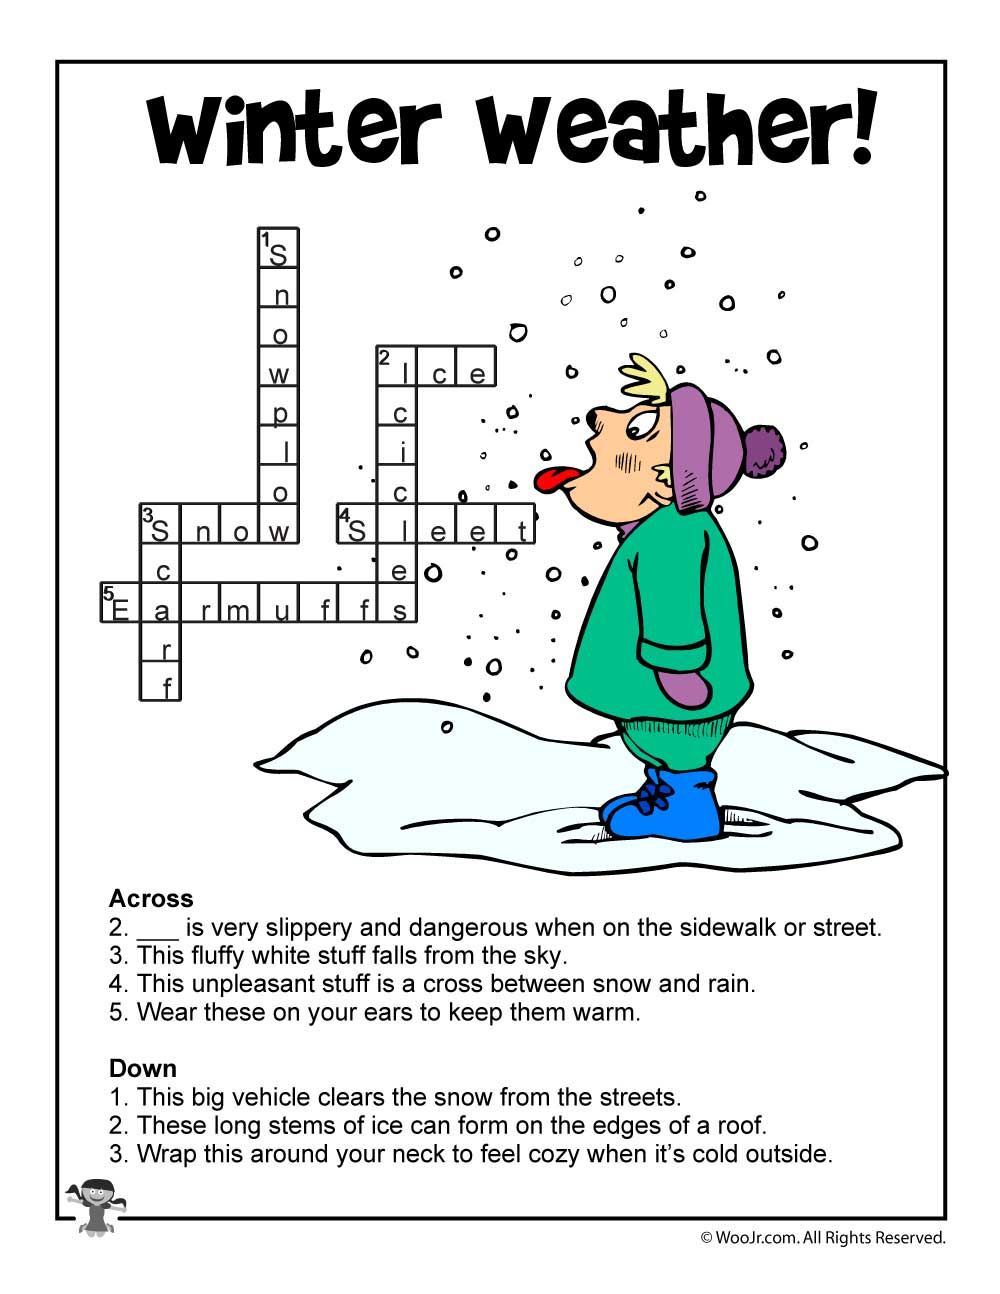 Winter Weather Crossword Puzzle Answer Key | Woo! Jr. Kids Activities - Printable Crossword Puzzles Winter